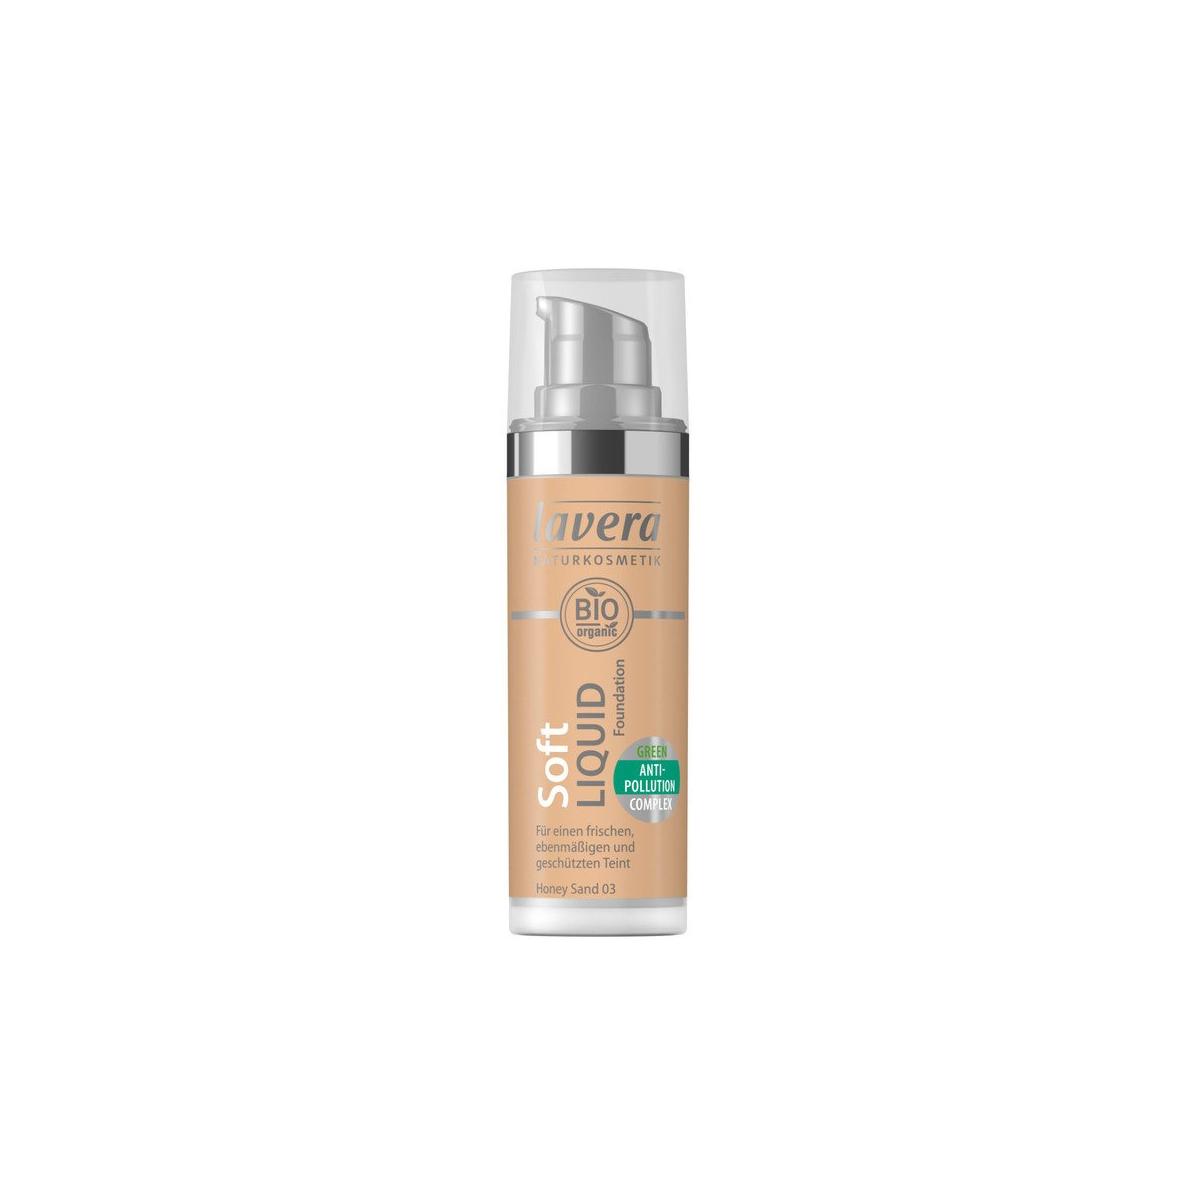 Soft Liquid Foundation -Honey Sand 03- Flasche 30 ml/Plastik Einweg - Lavera